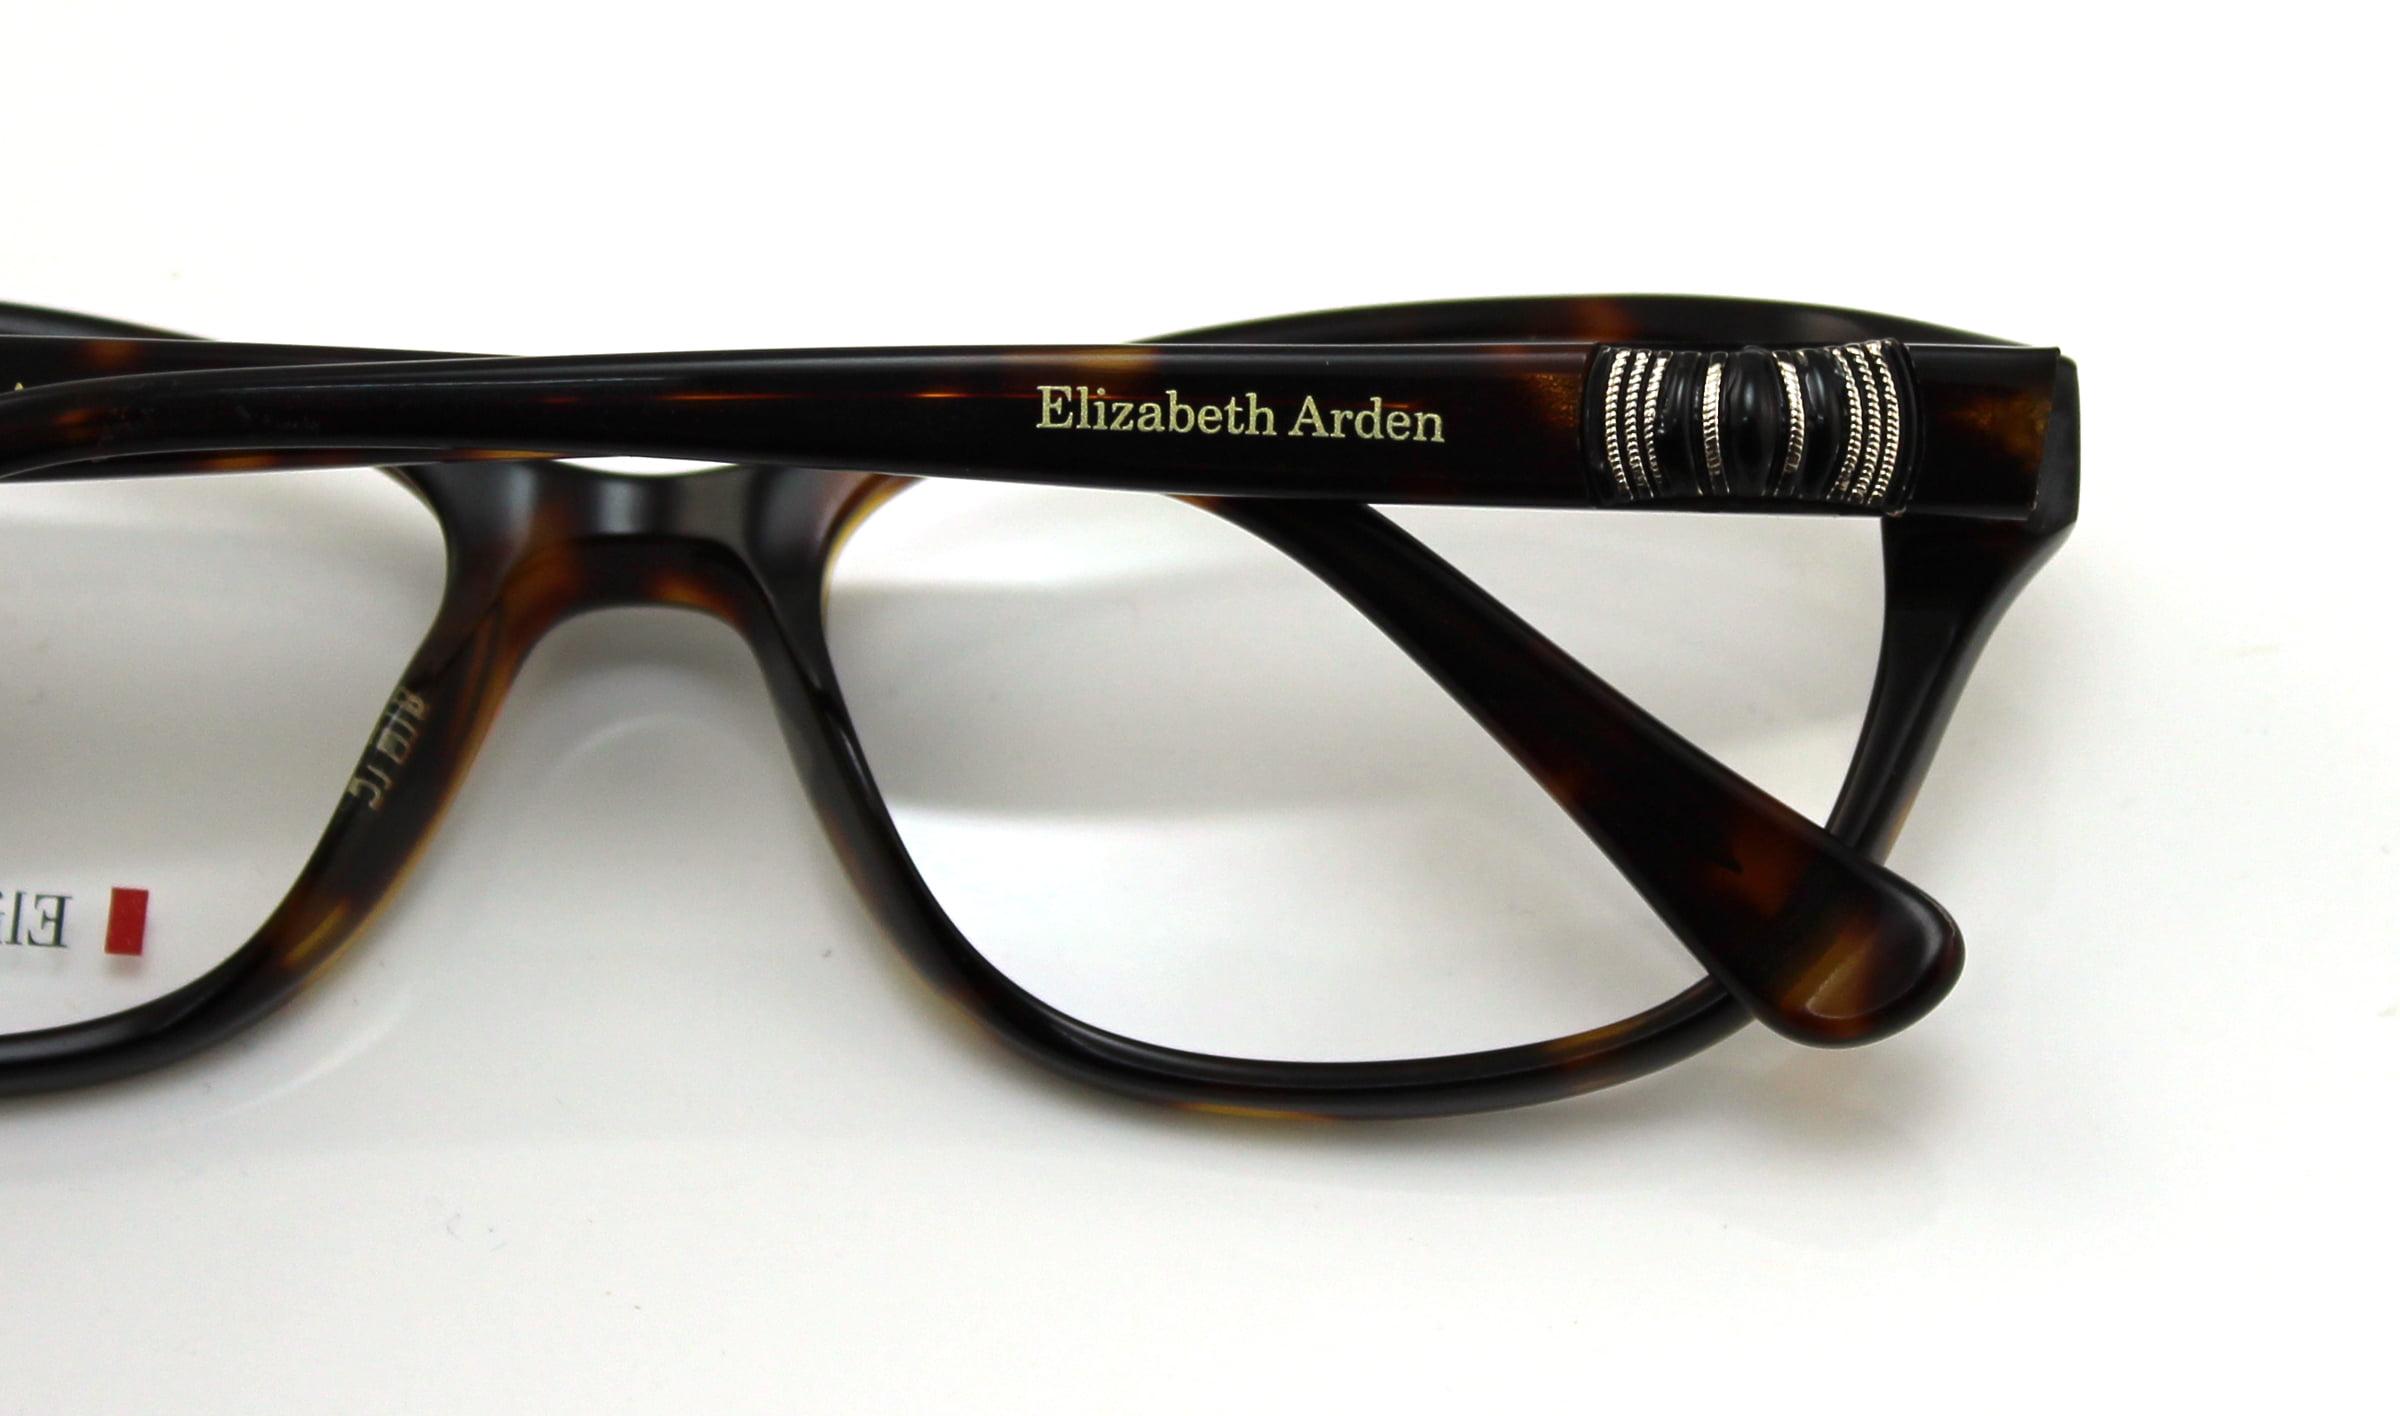 fd6137572240 Elizabeth Arden Women s Prescription Glasses